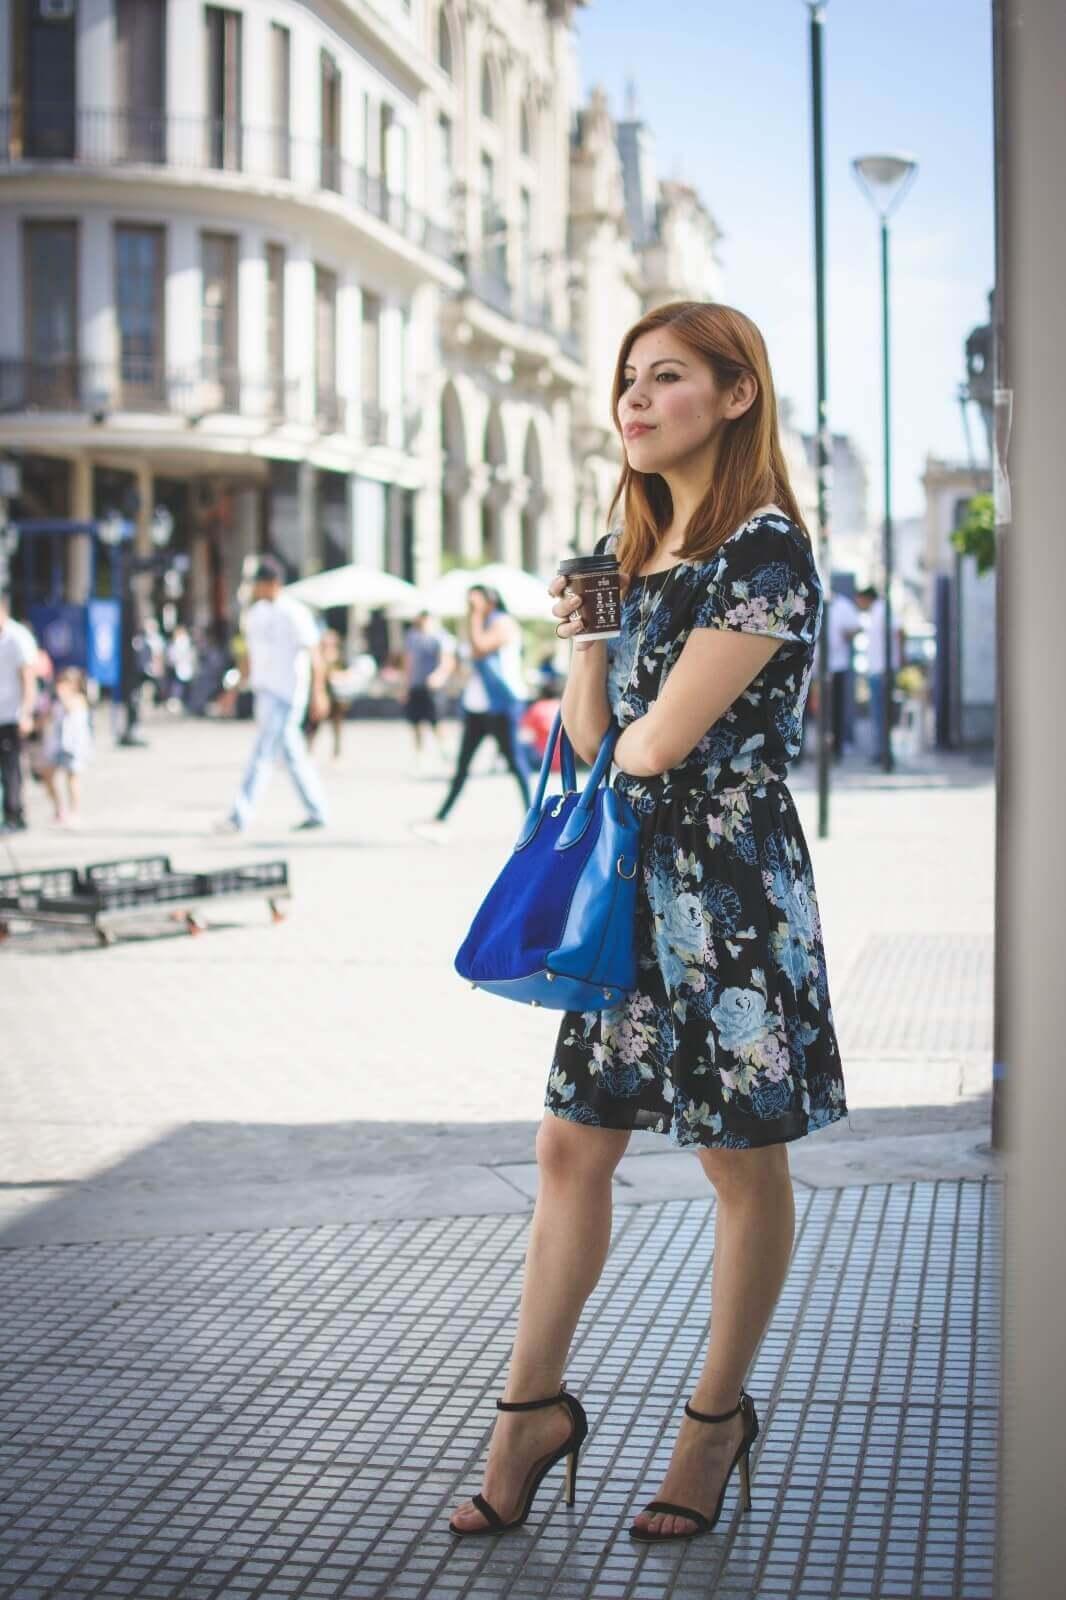 gamiss-black-strappy-sandals-blue-floral-dress-rosegal-cobalt-blue-tote-bag-deborah-ferrero-style-by-deb09